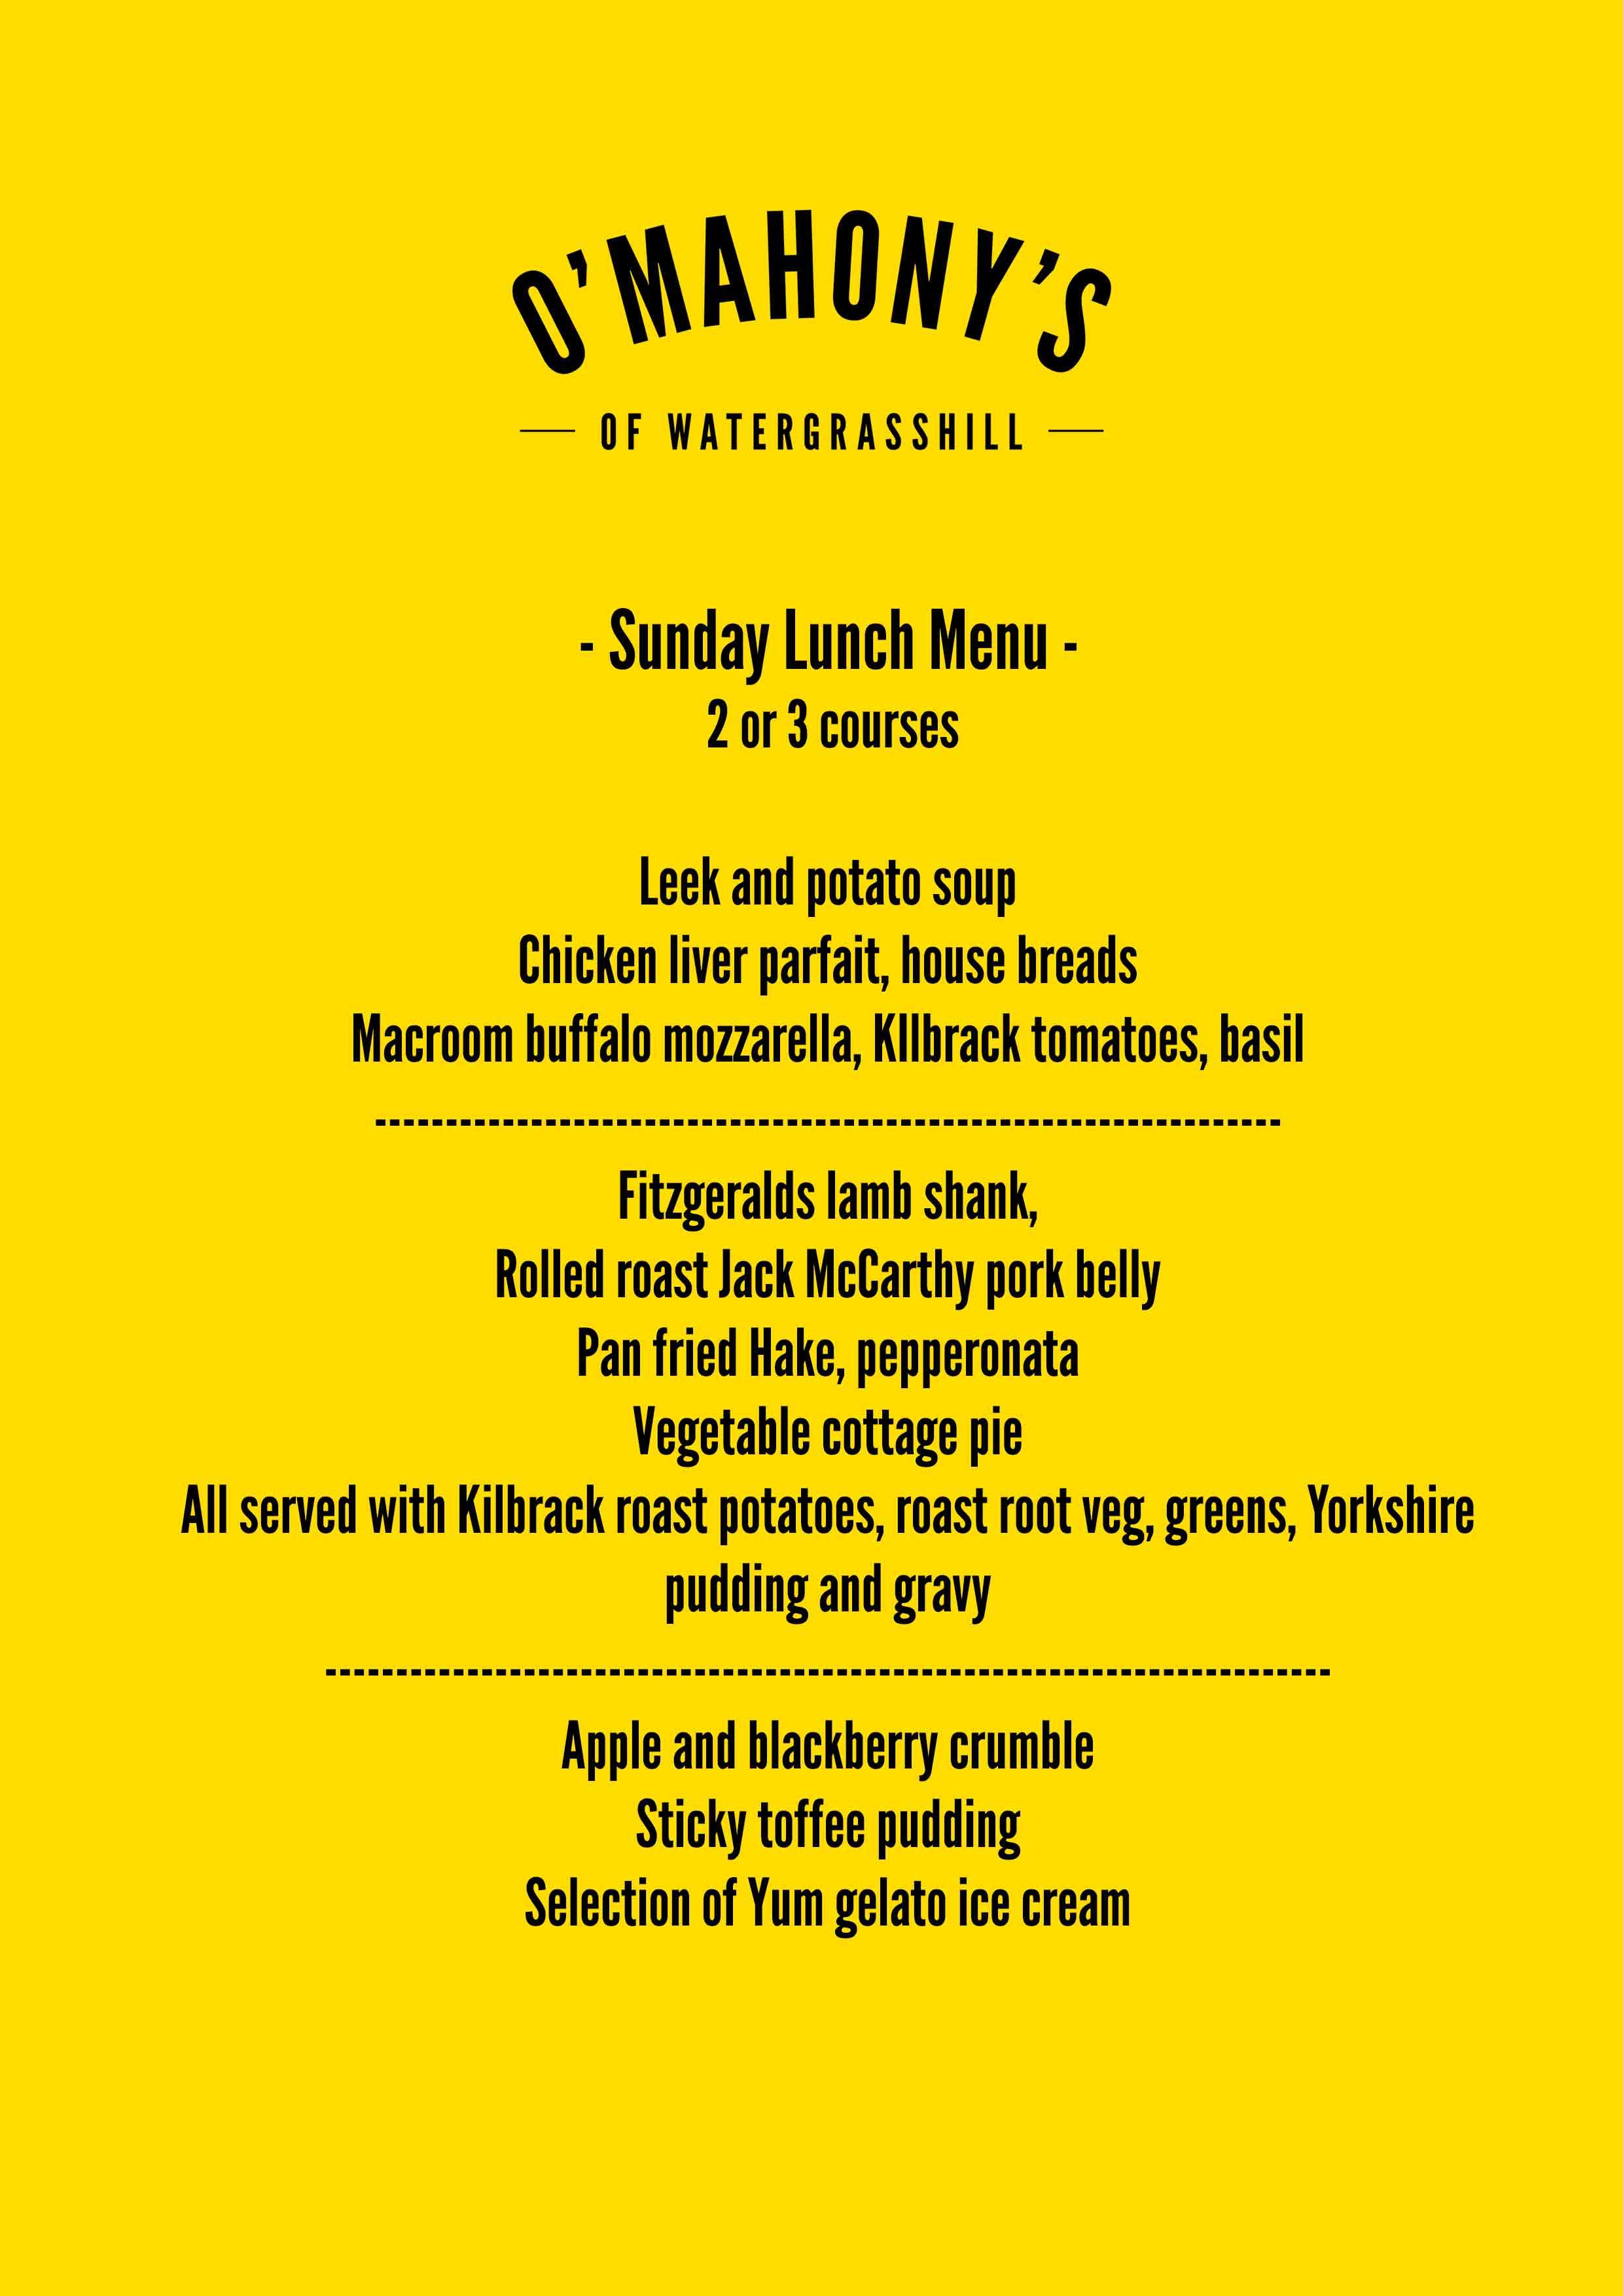 sunday lunch menu.jpg